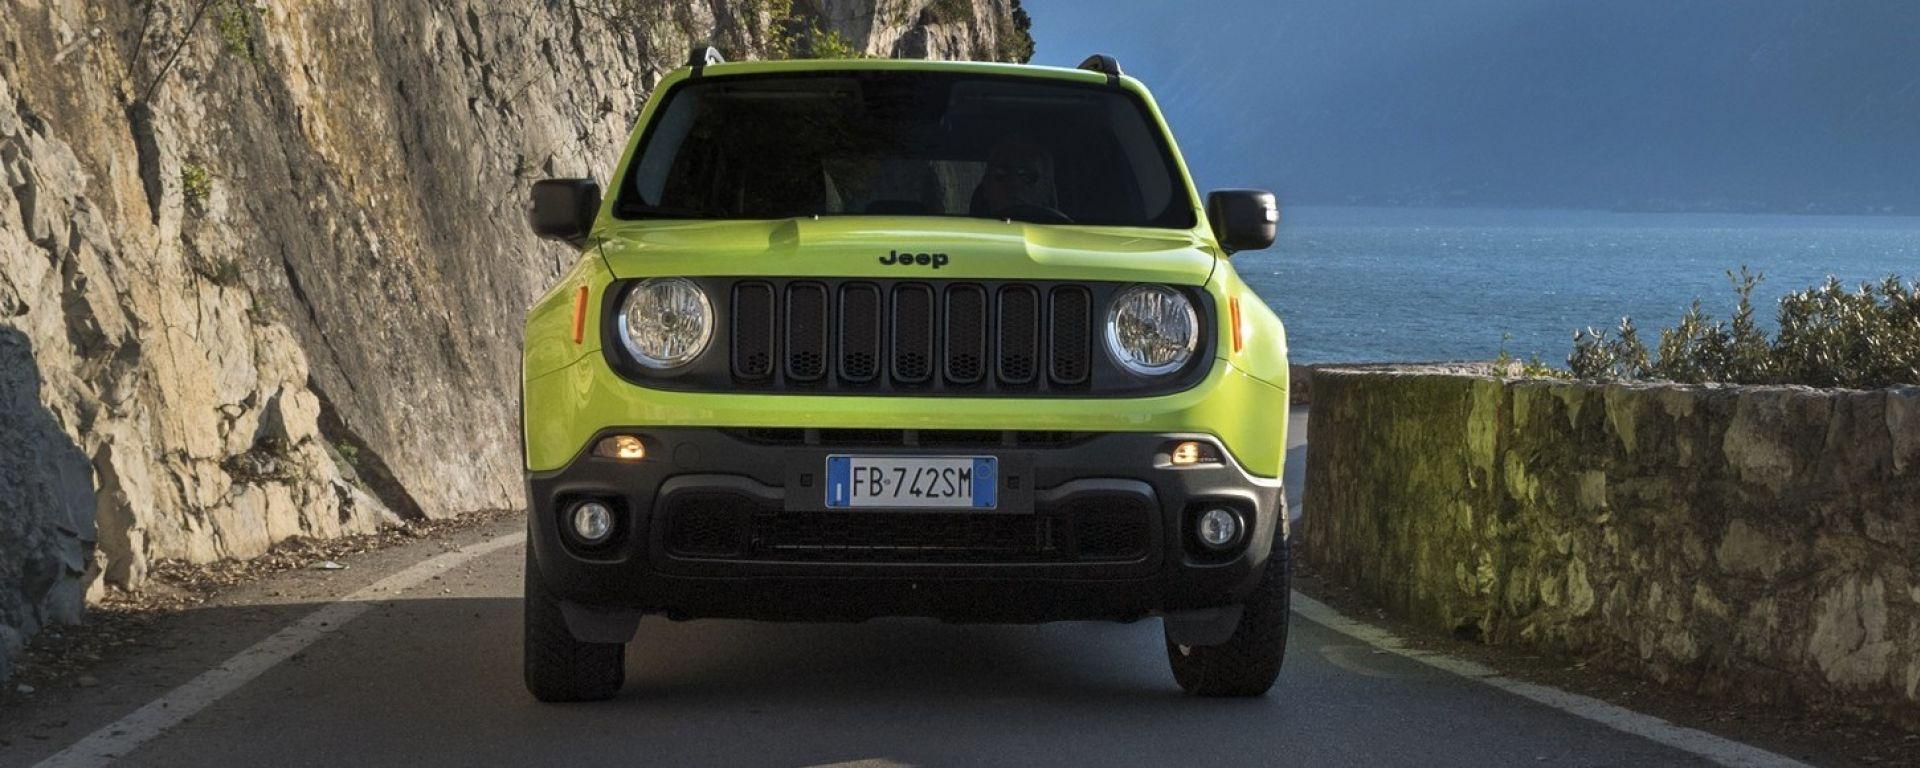 Jeep Renegade Upland, la soft Trailhawk